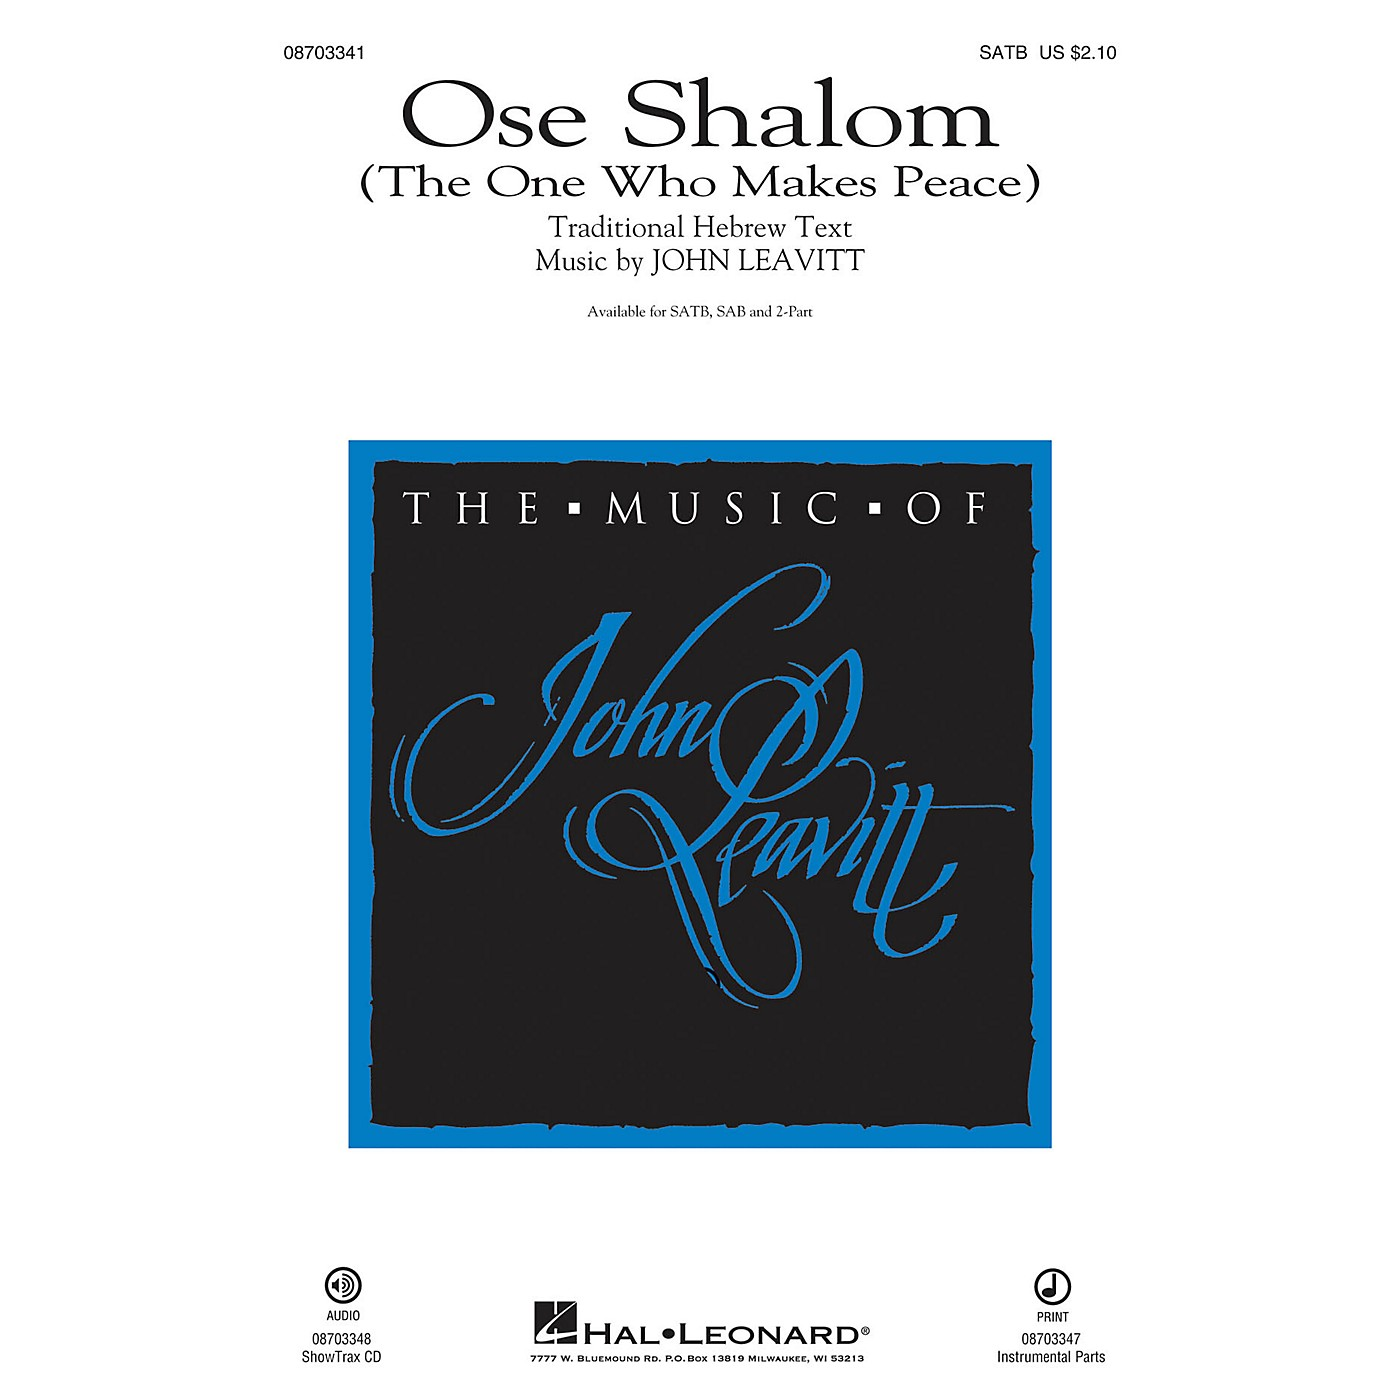 Hal Leonard Ose Shalom (The One Who Makes Peace) (SATB) SATB thumbnail